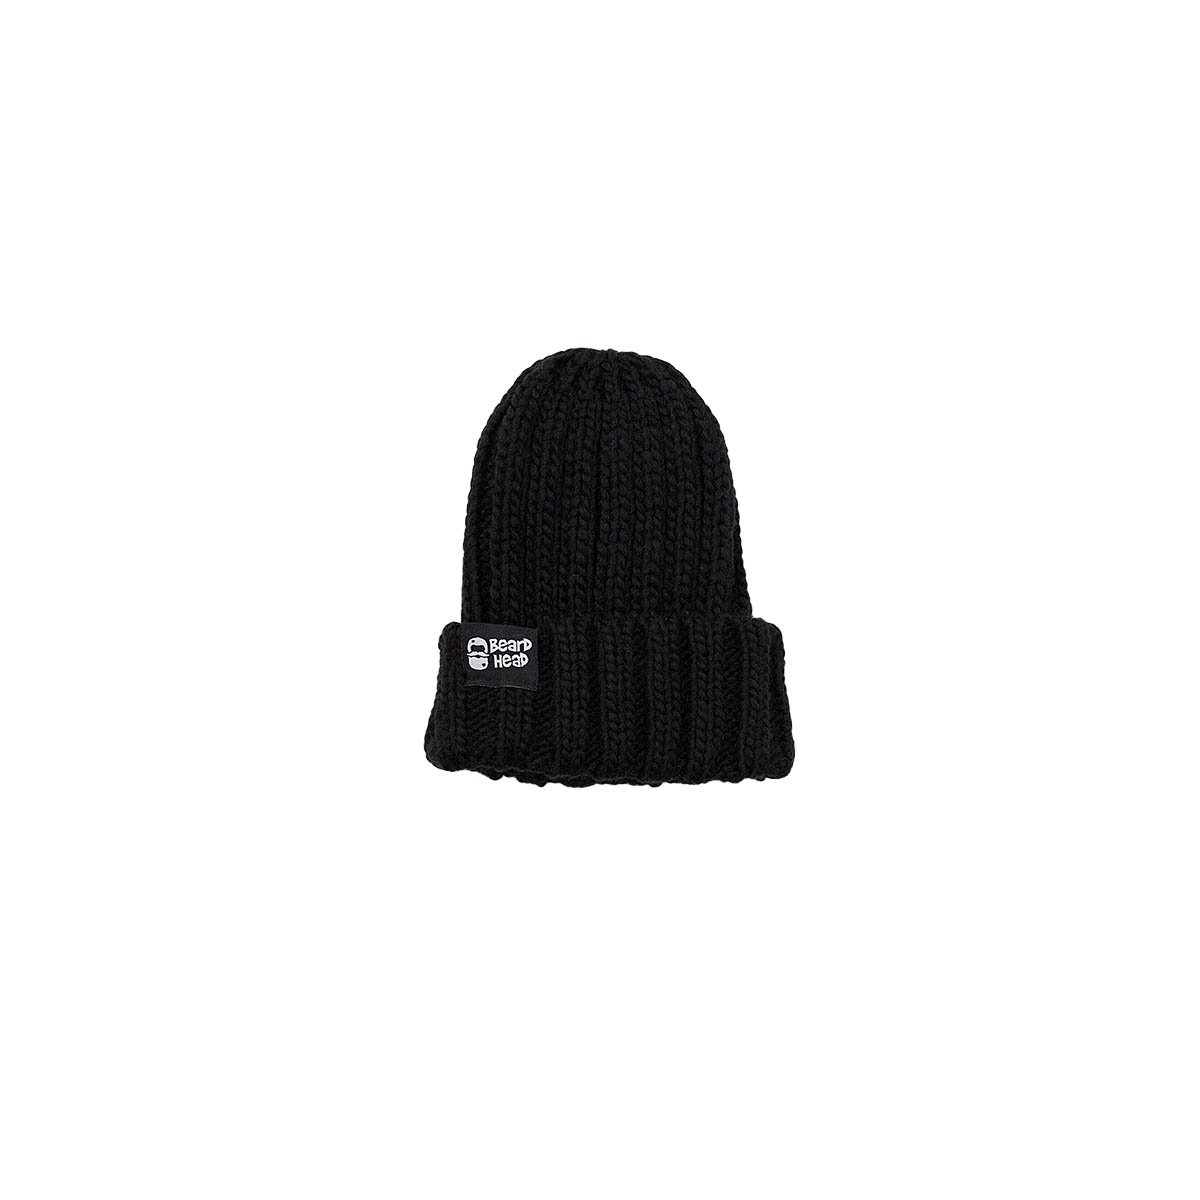 Beard Head Kid Vagabond Beard Beanie Knit Hat and Fake Beard for Kids Toddlers